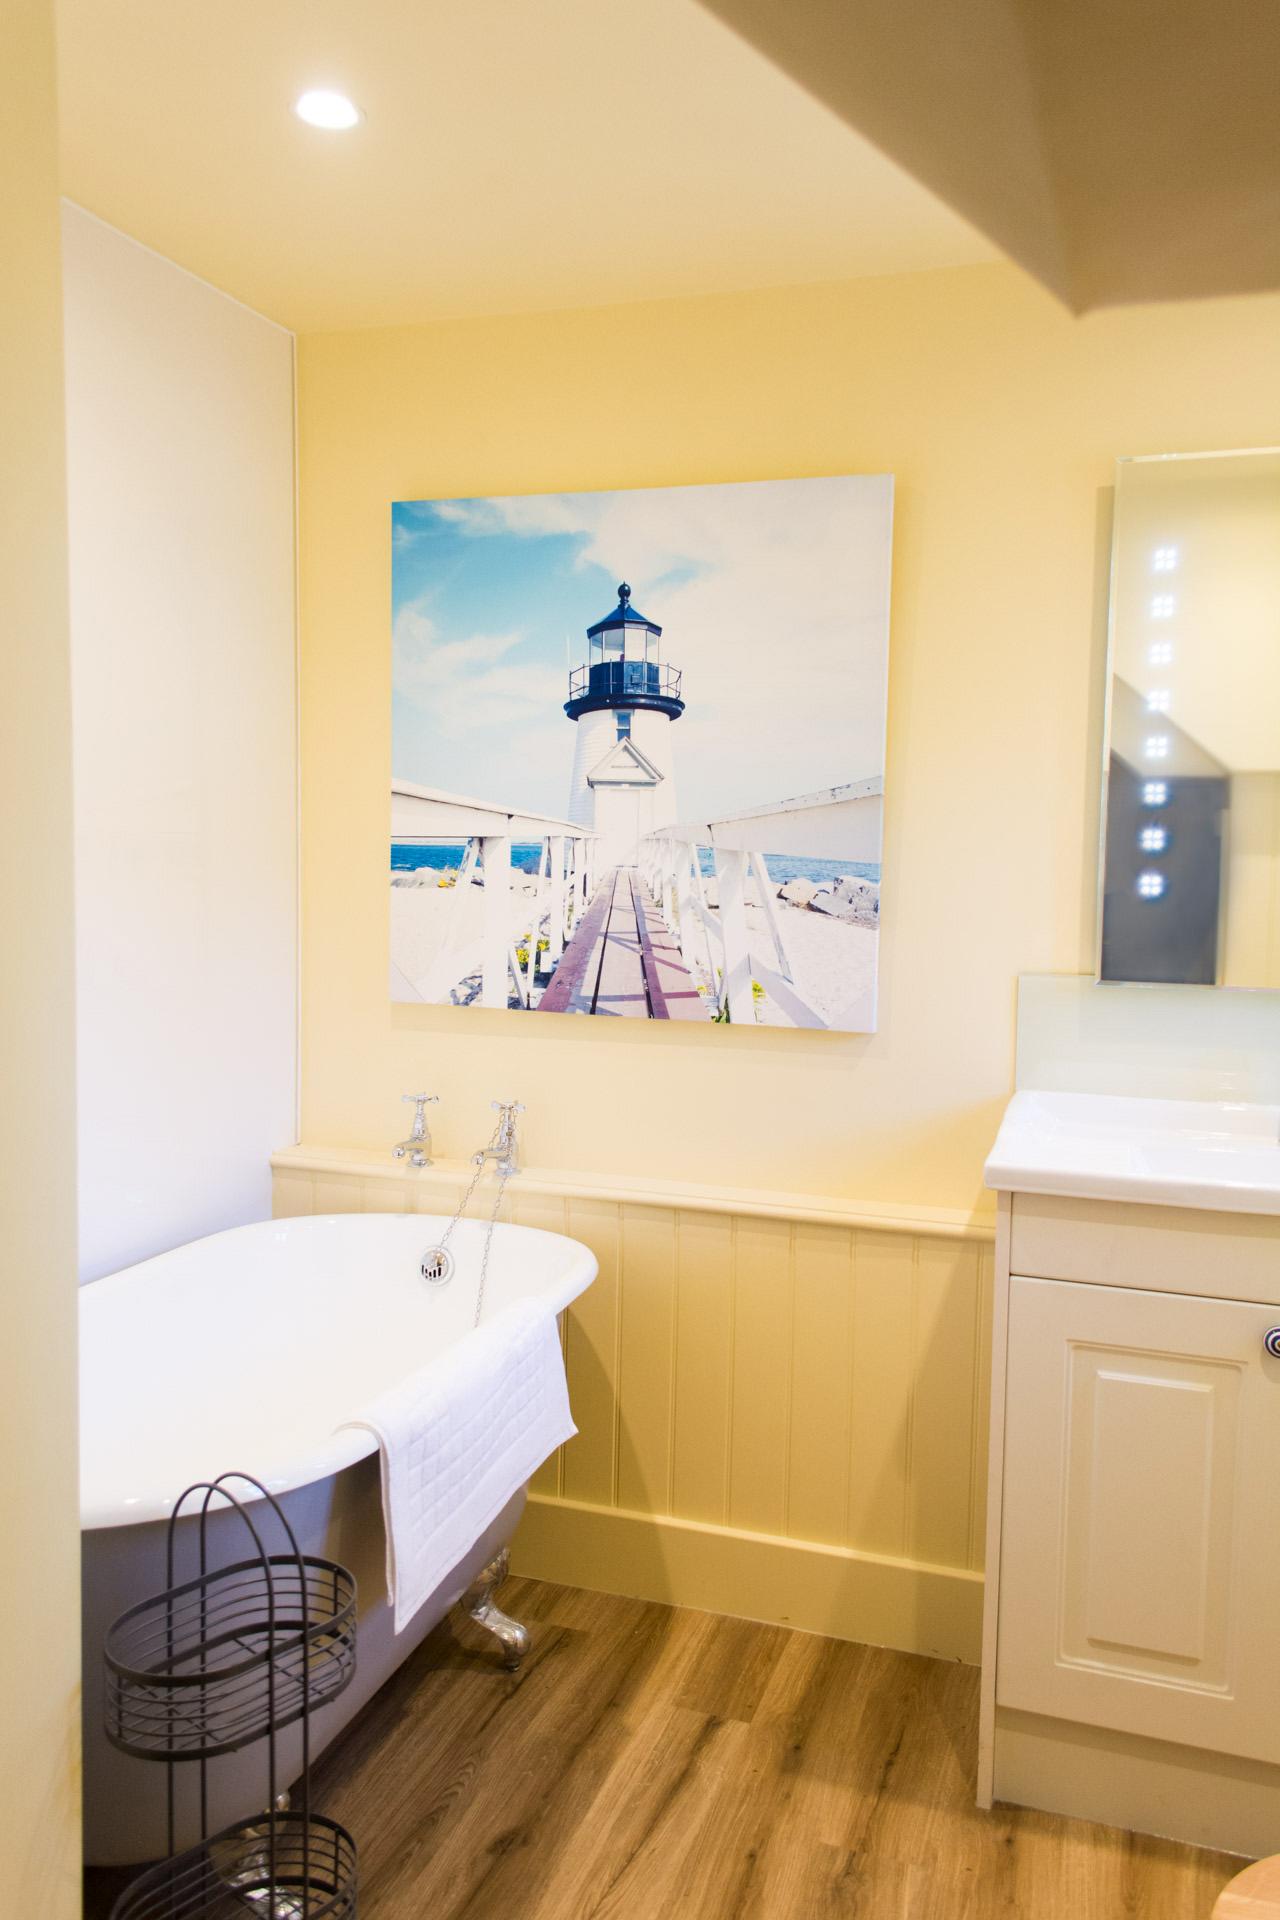 Bathroom photo showing yellow walls and bath tub.